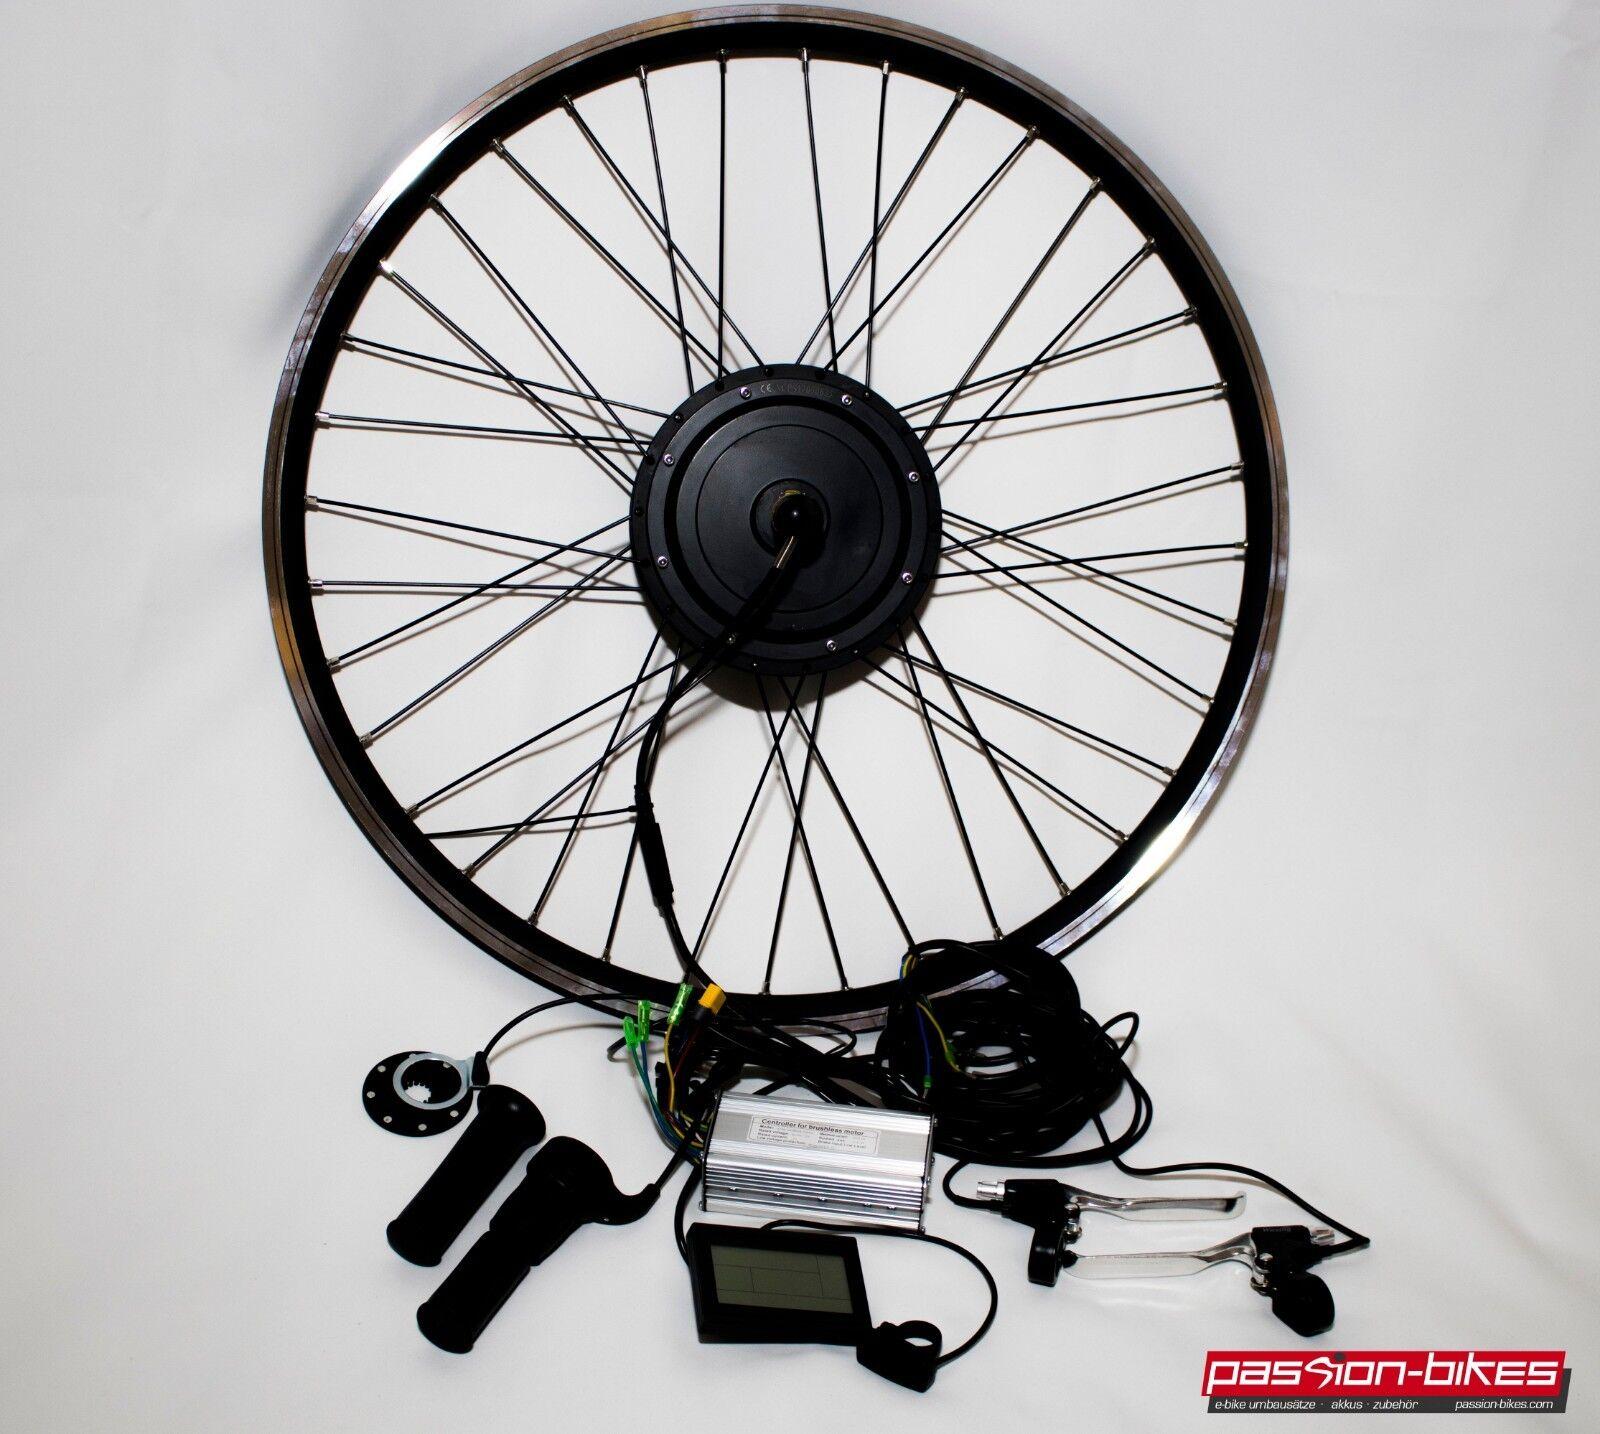 E-Bike Pedelec Front Wheel Conversion Kit Kit 500 Watt Front Motor 28 kt3 Display